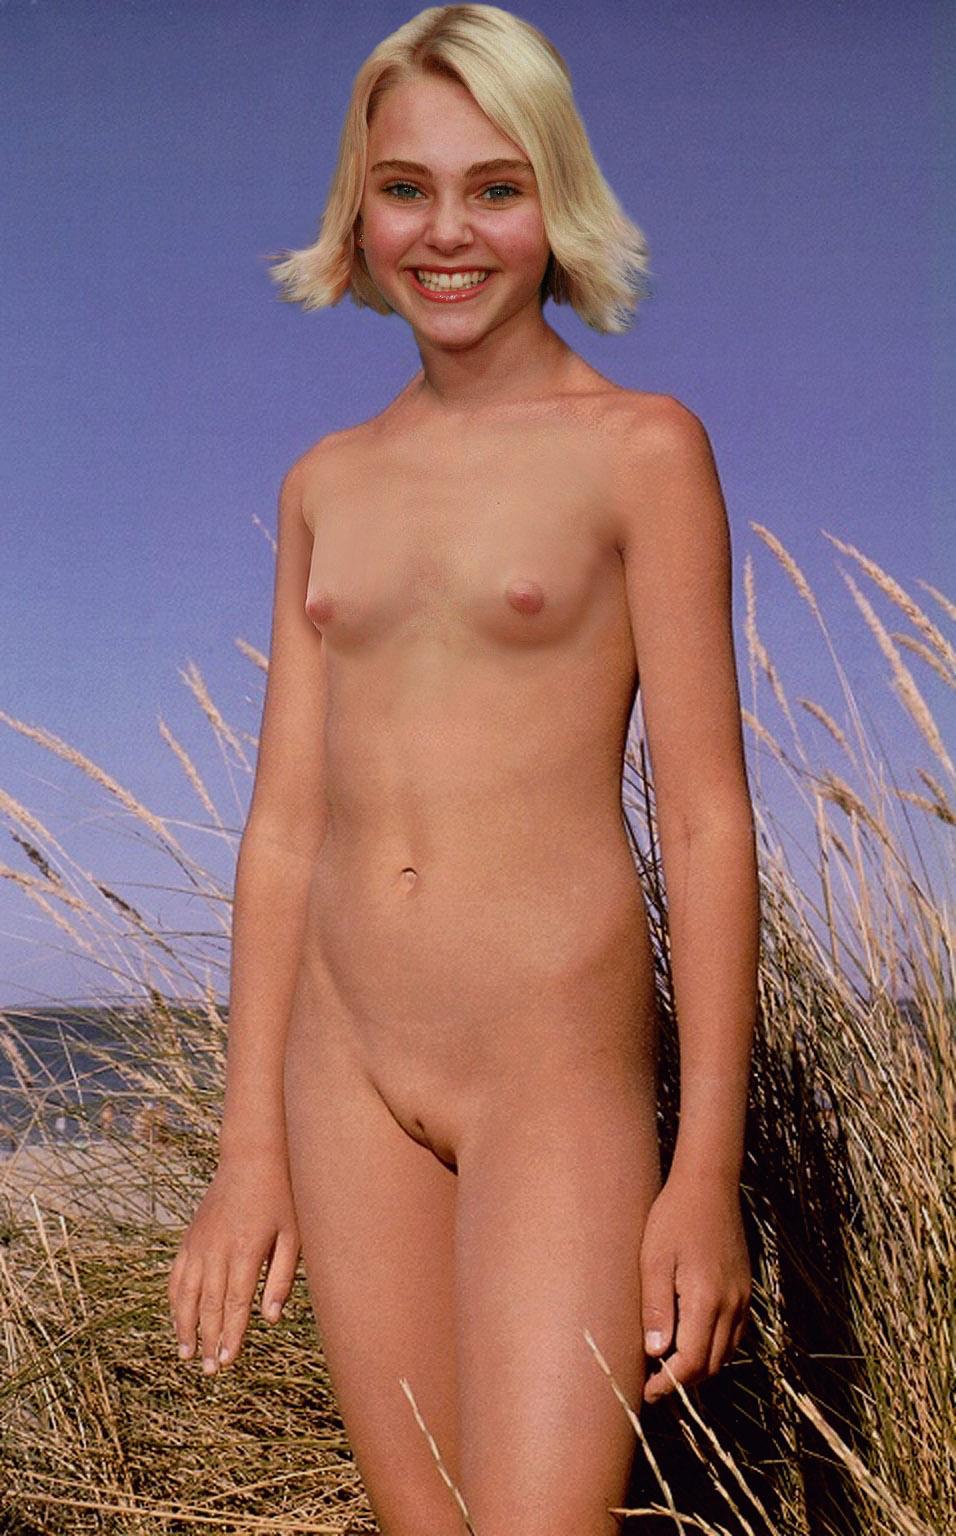 annasophia rob nude them dignity